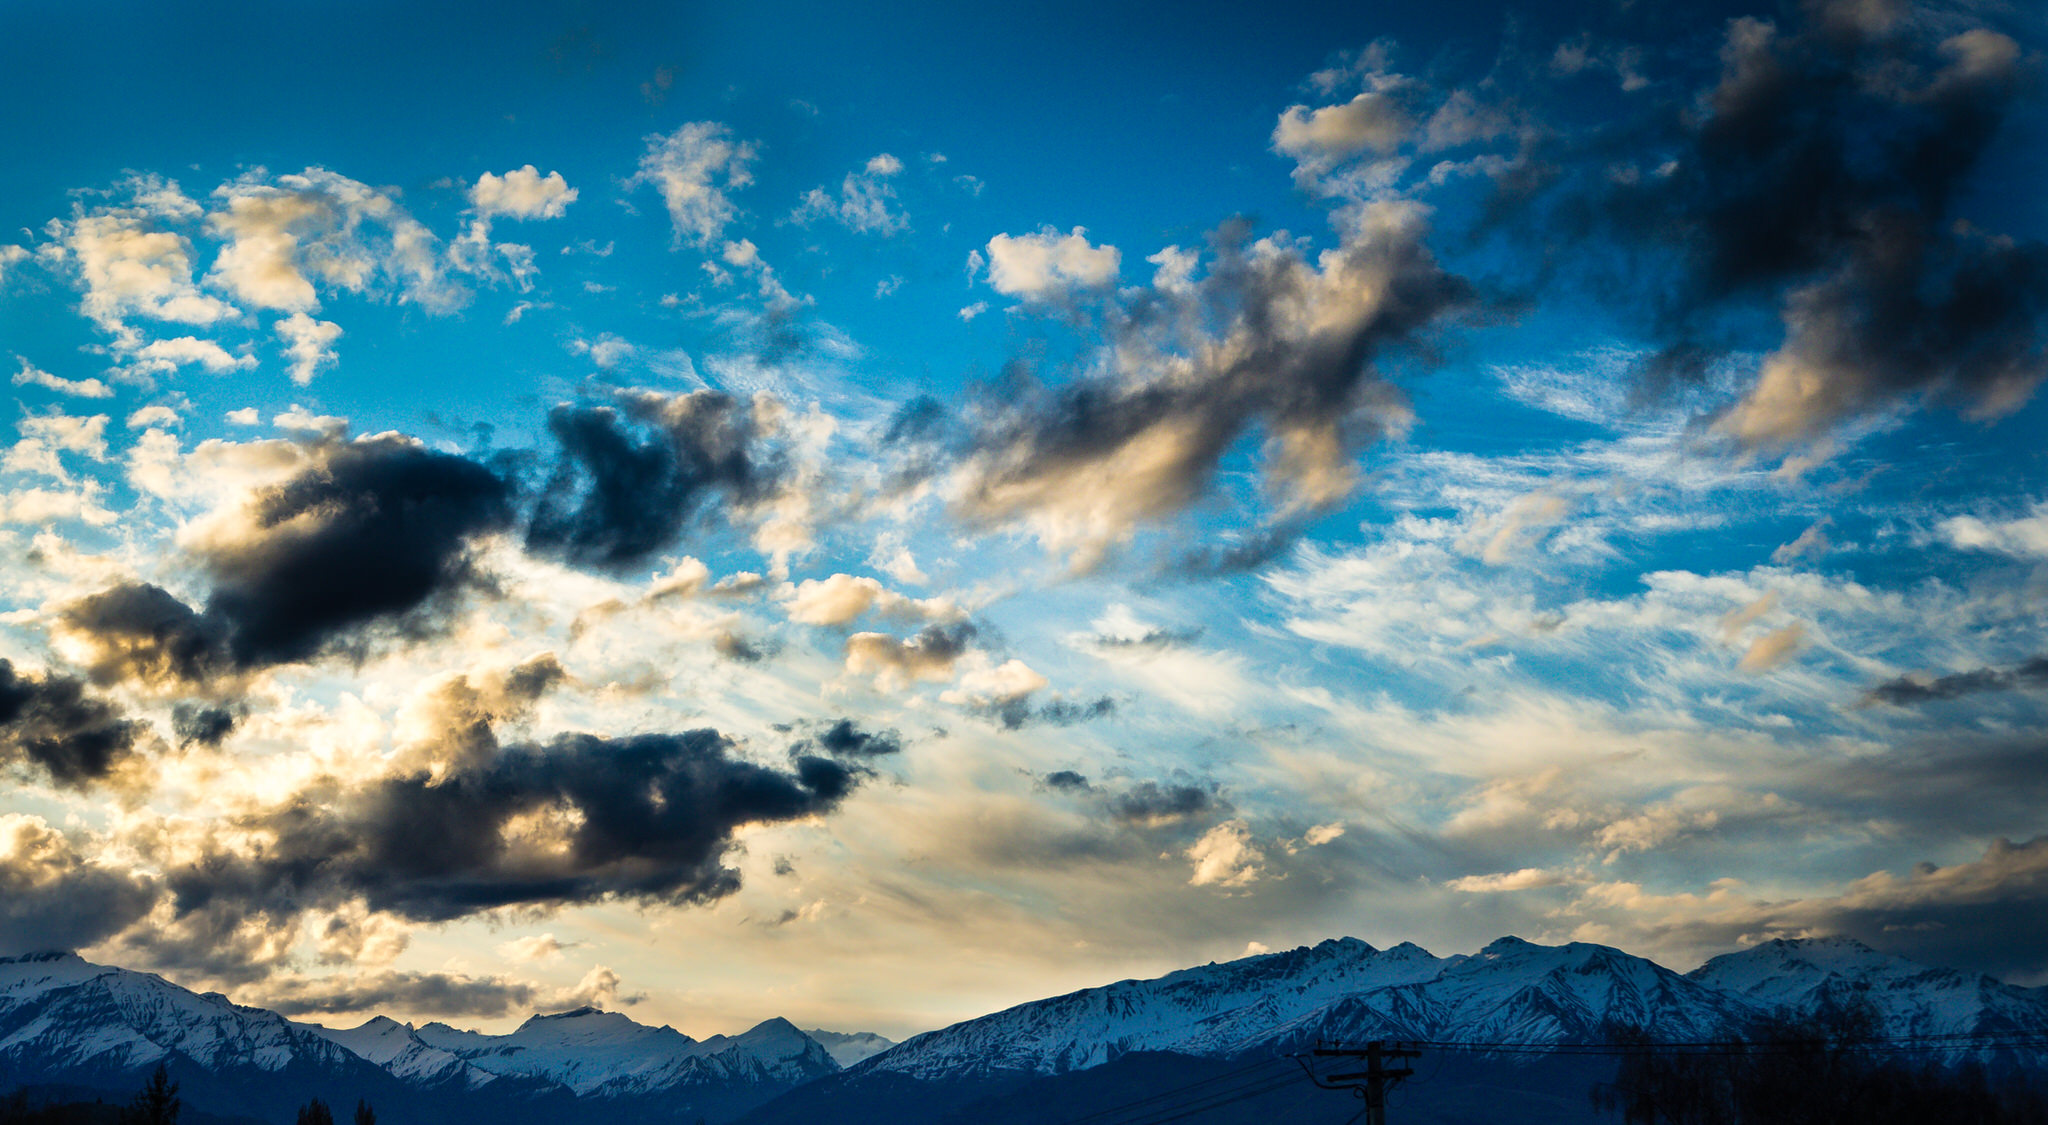 painted-clouds- dusk-lake-wanaka.jpg